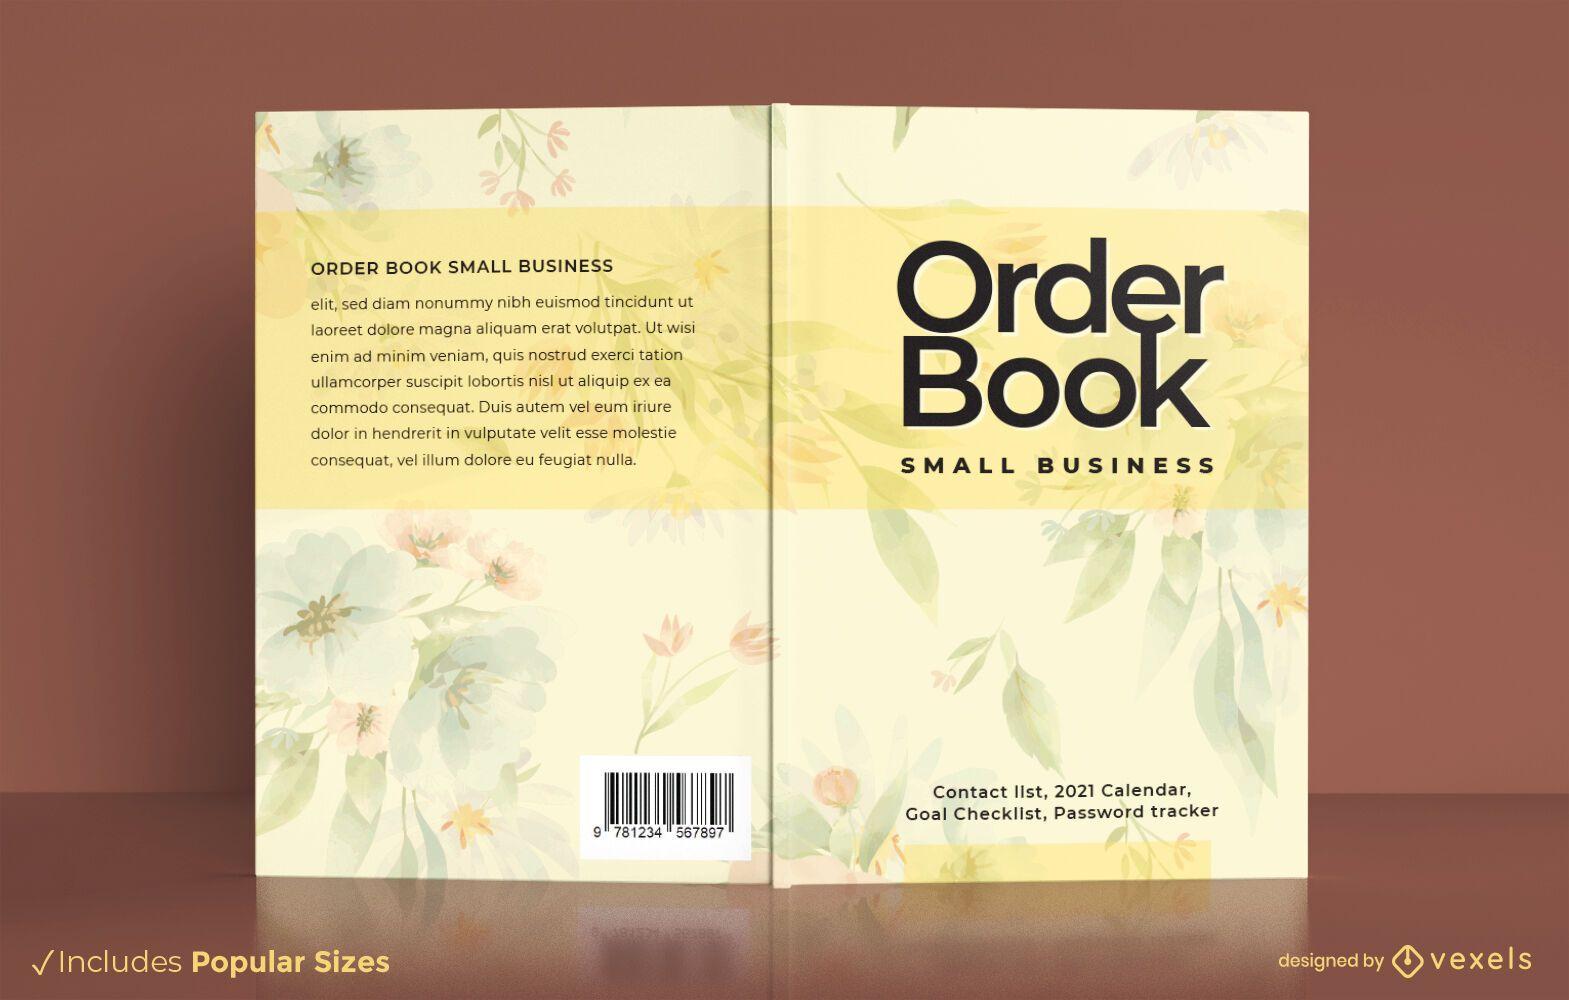 Order book business book cover design